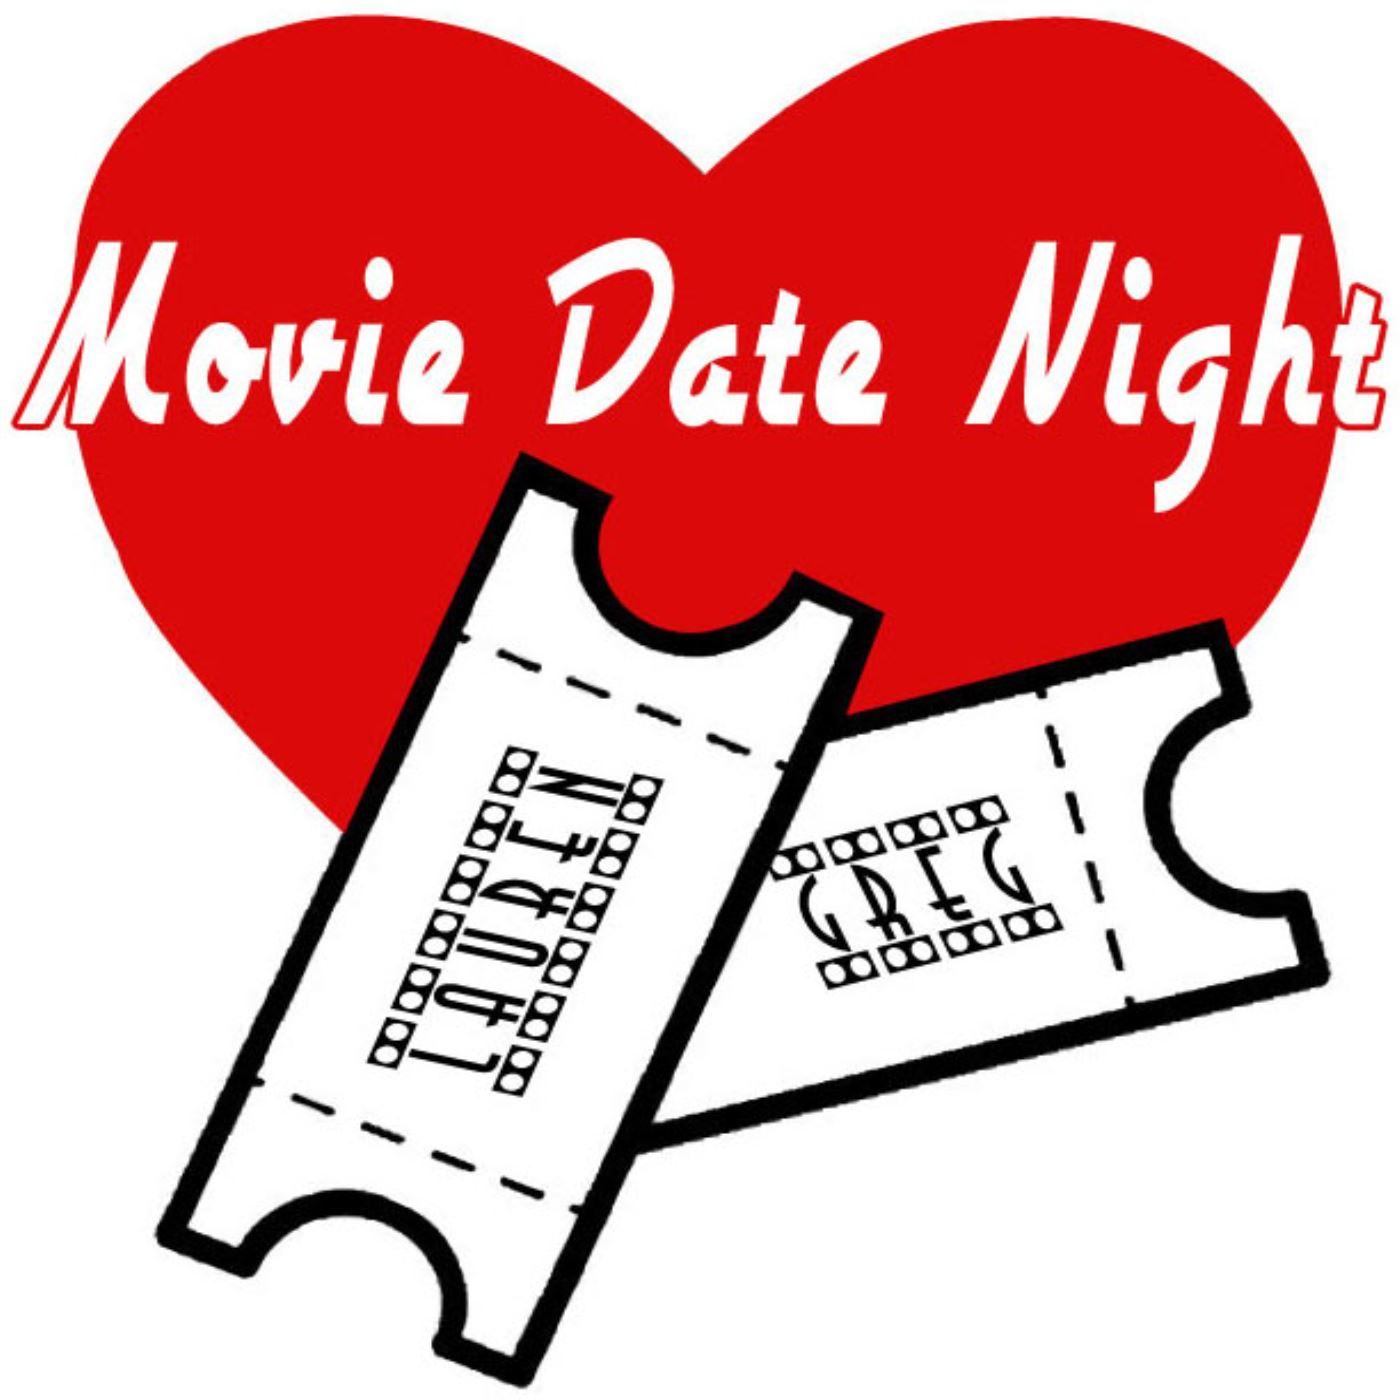 Dating nights